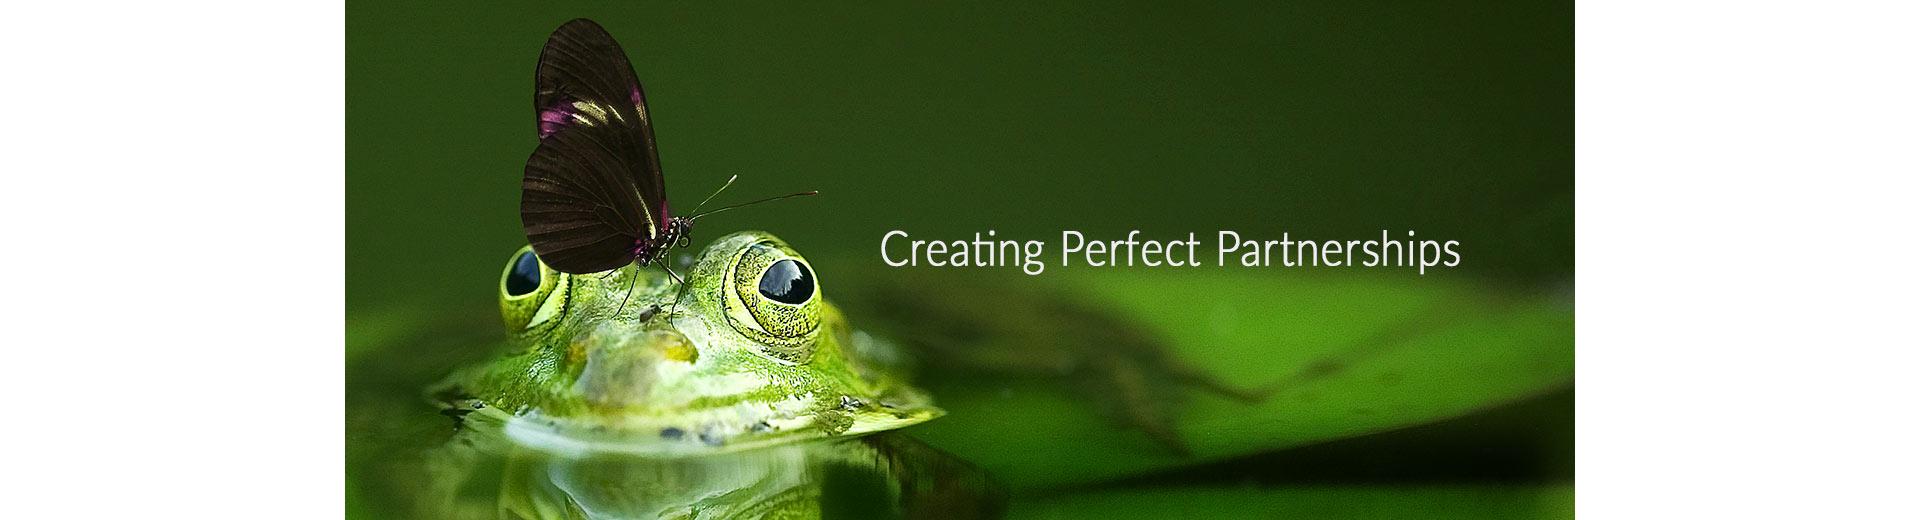 Web design Kidderminster Sammy Southall Webworks